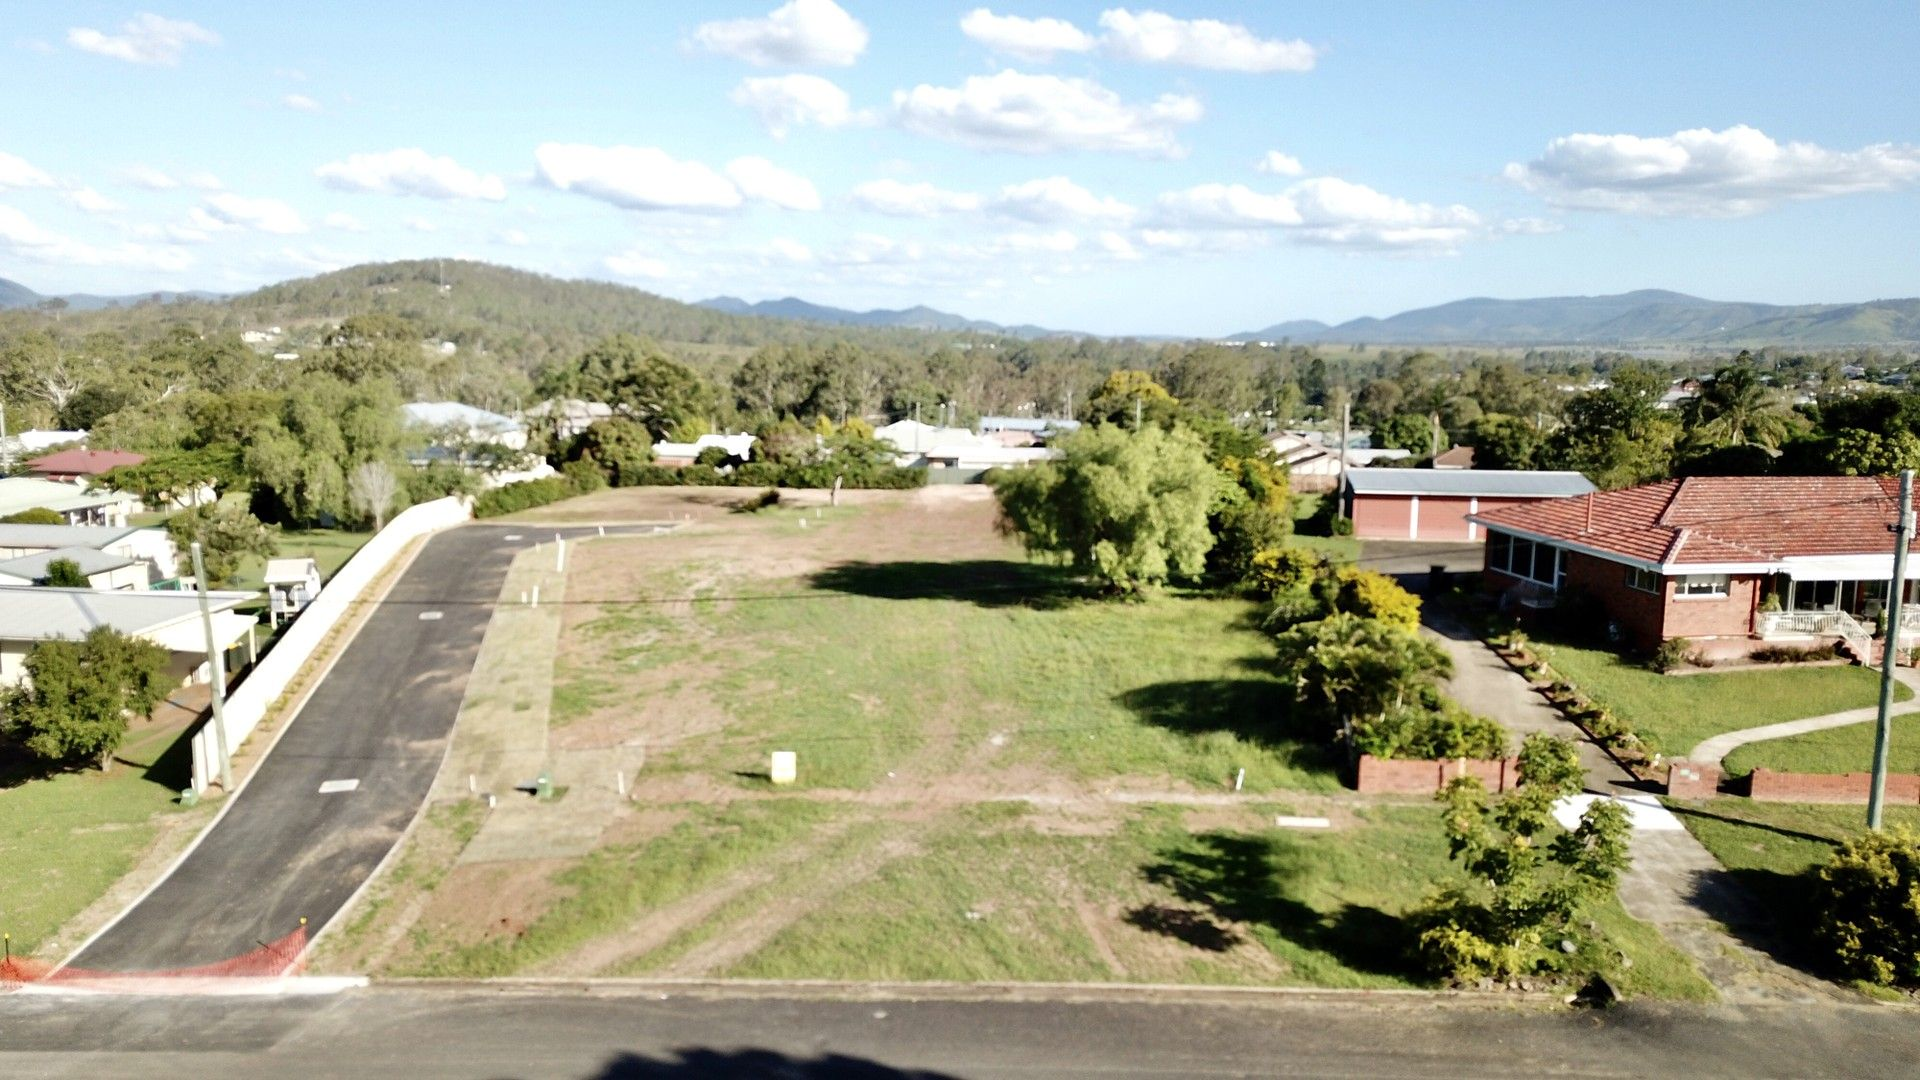 Lot 17, 29 Atthow, Kilcoy QLD 4515, Image 0